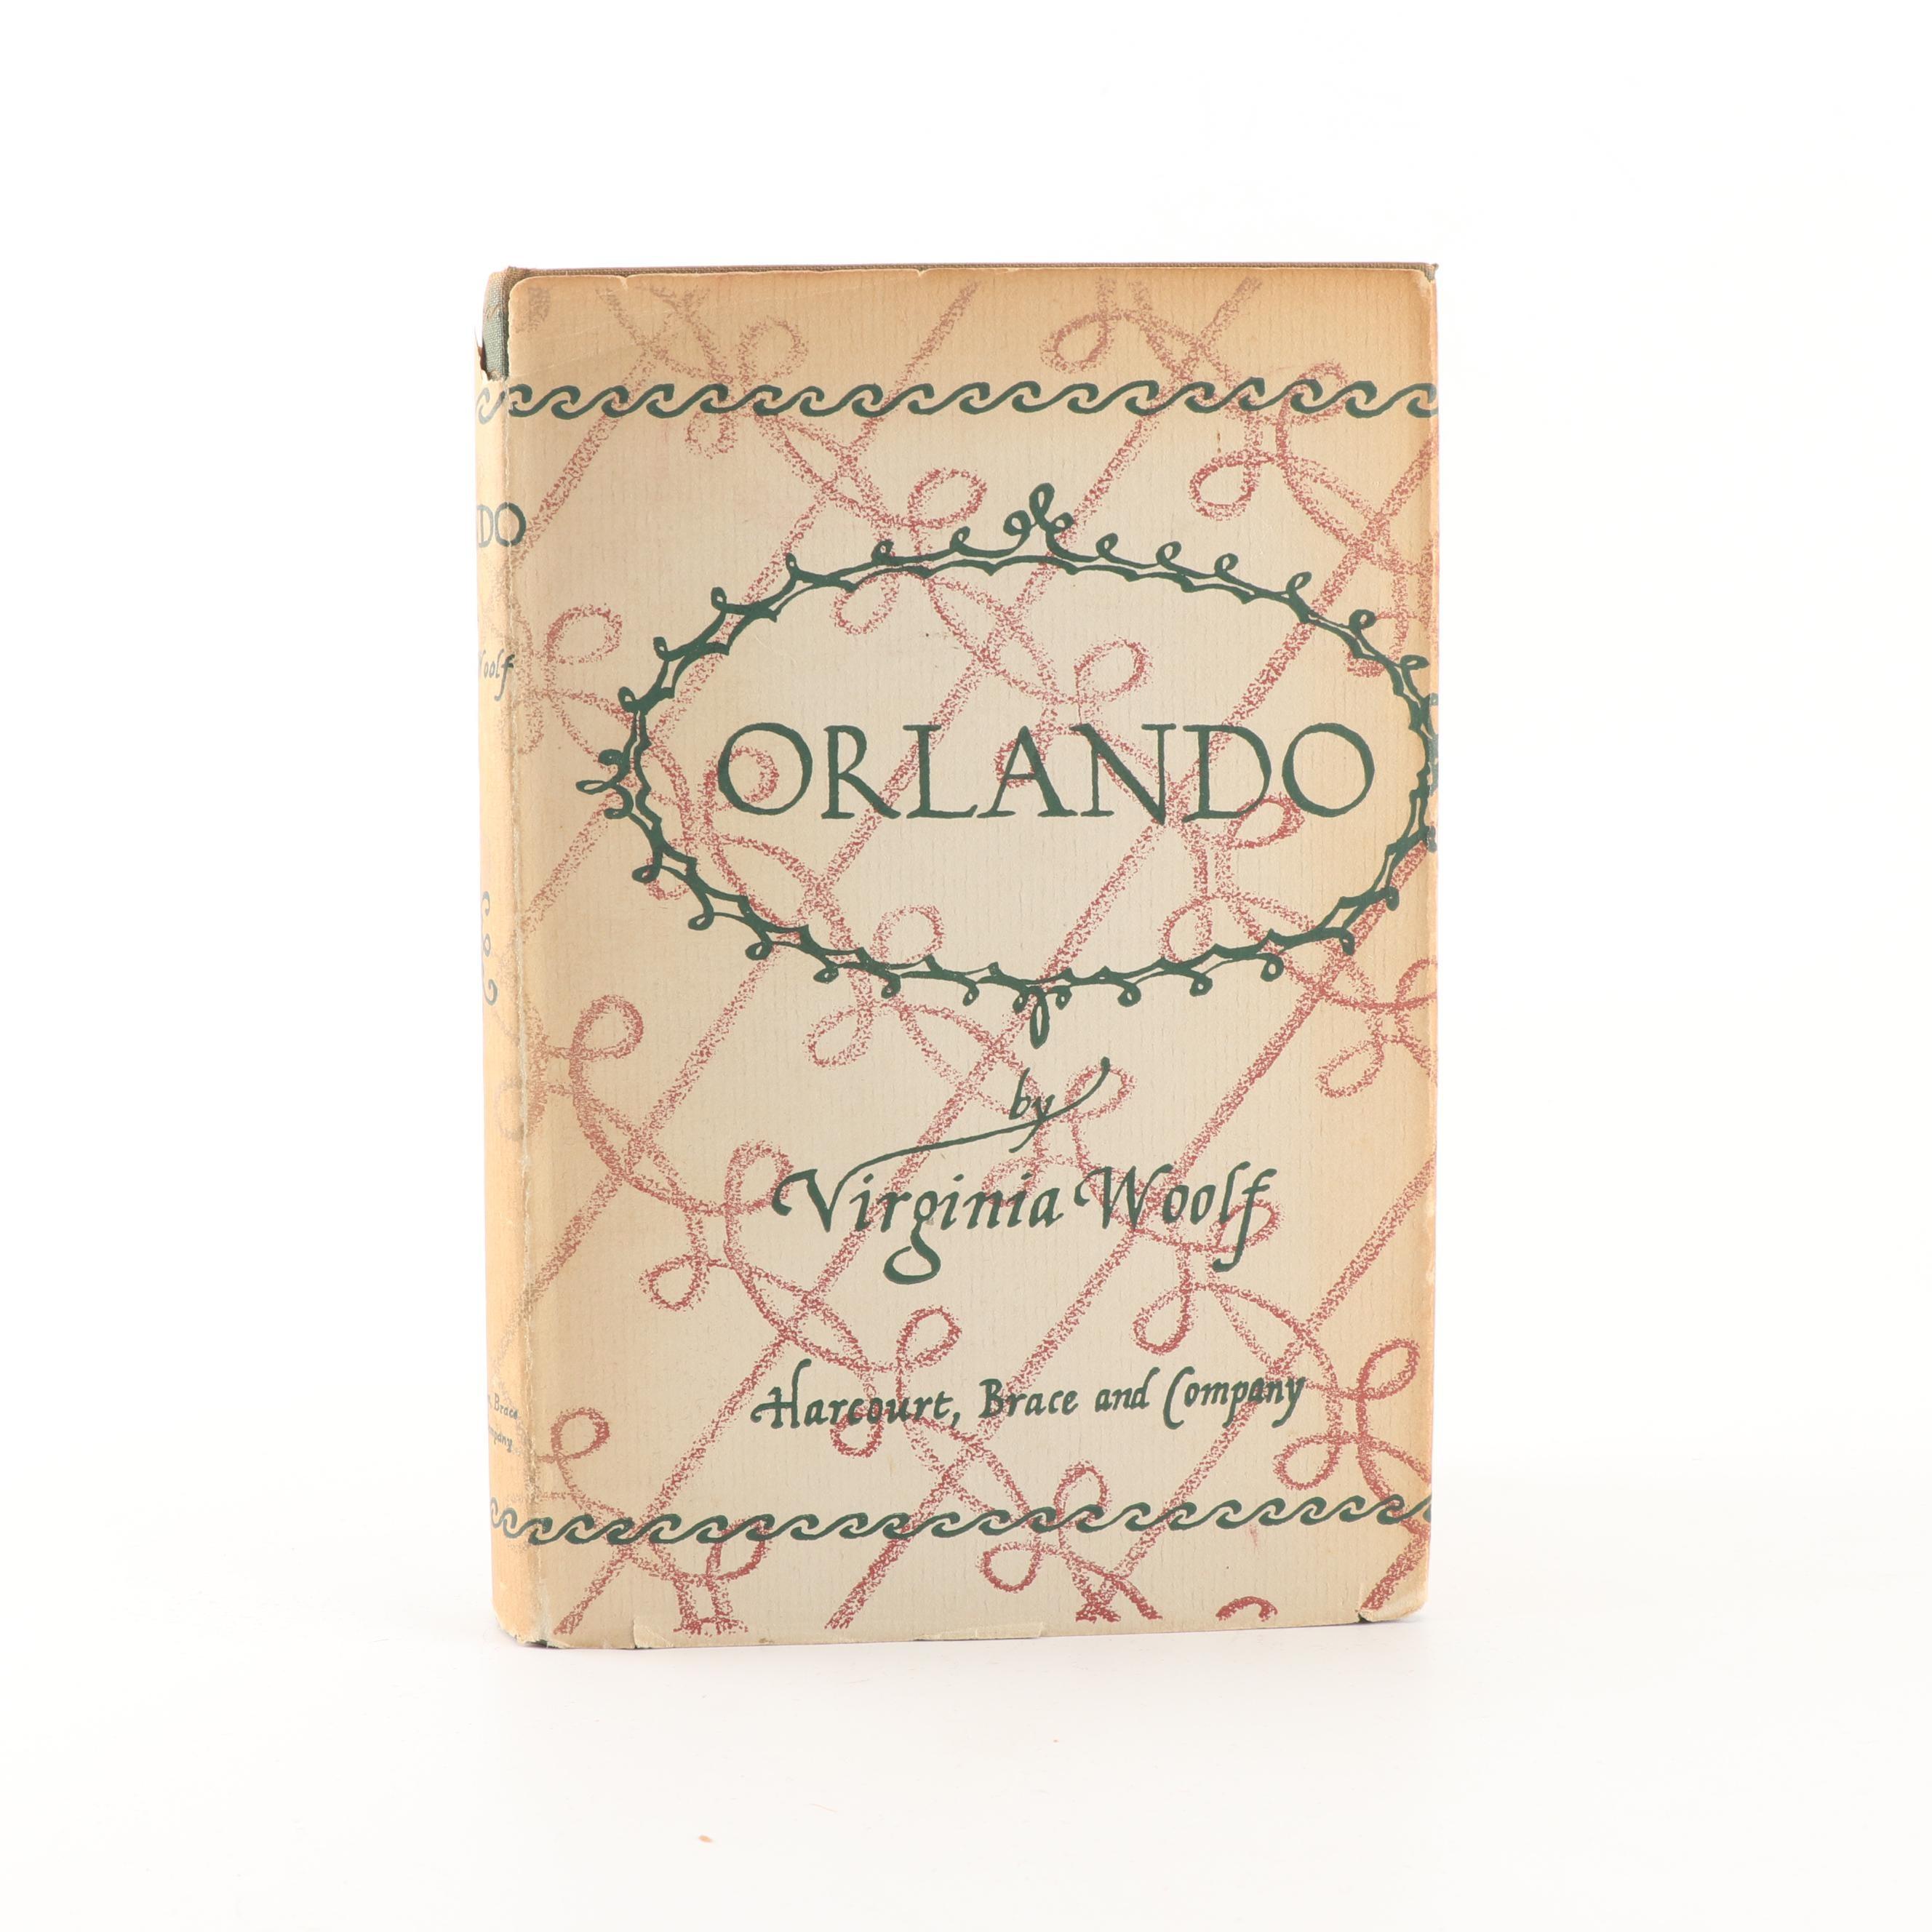 WOOLF, Virginia (1882-1941), Orlando, New York, 1928